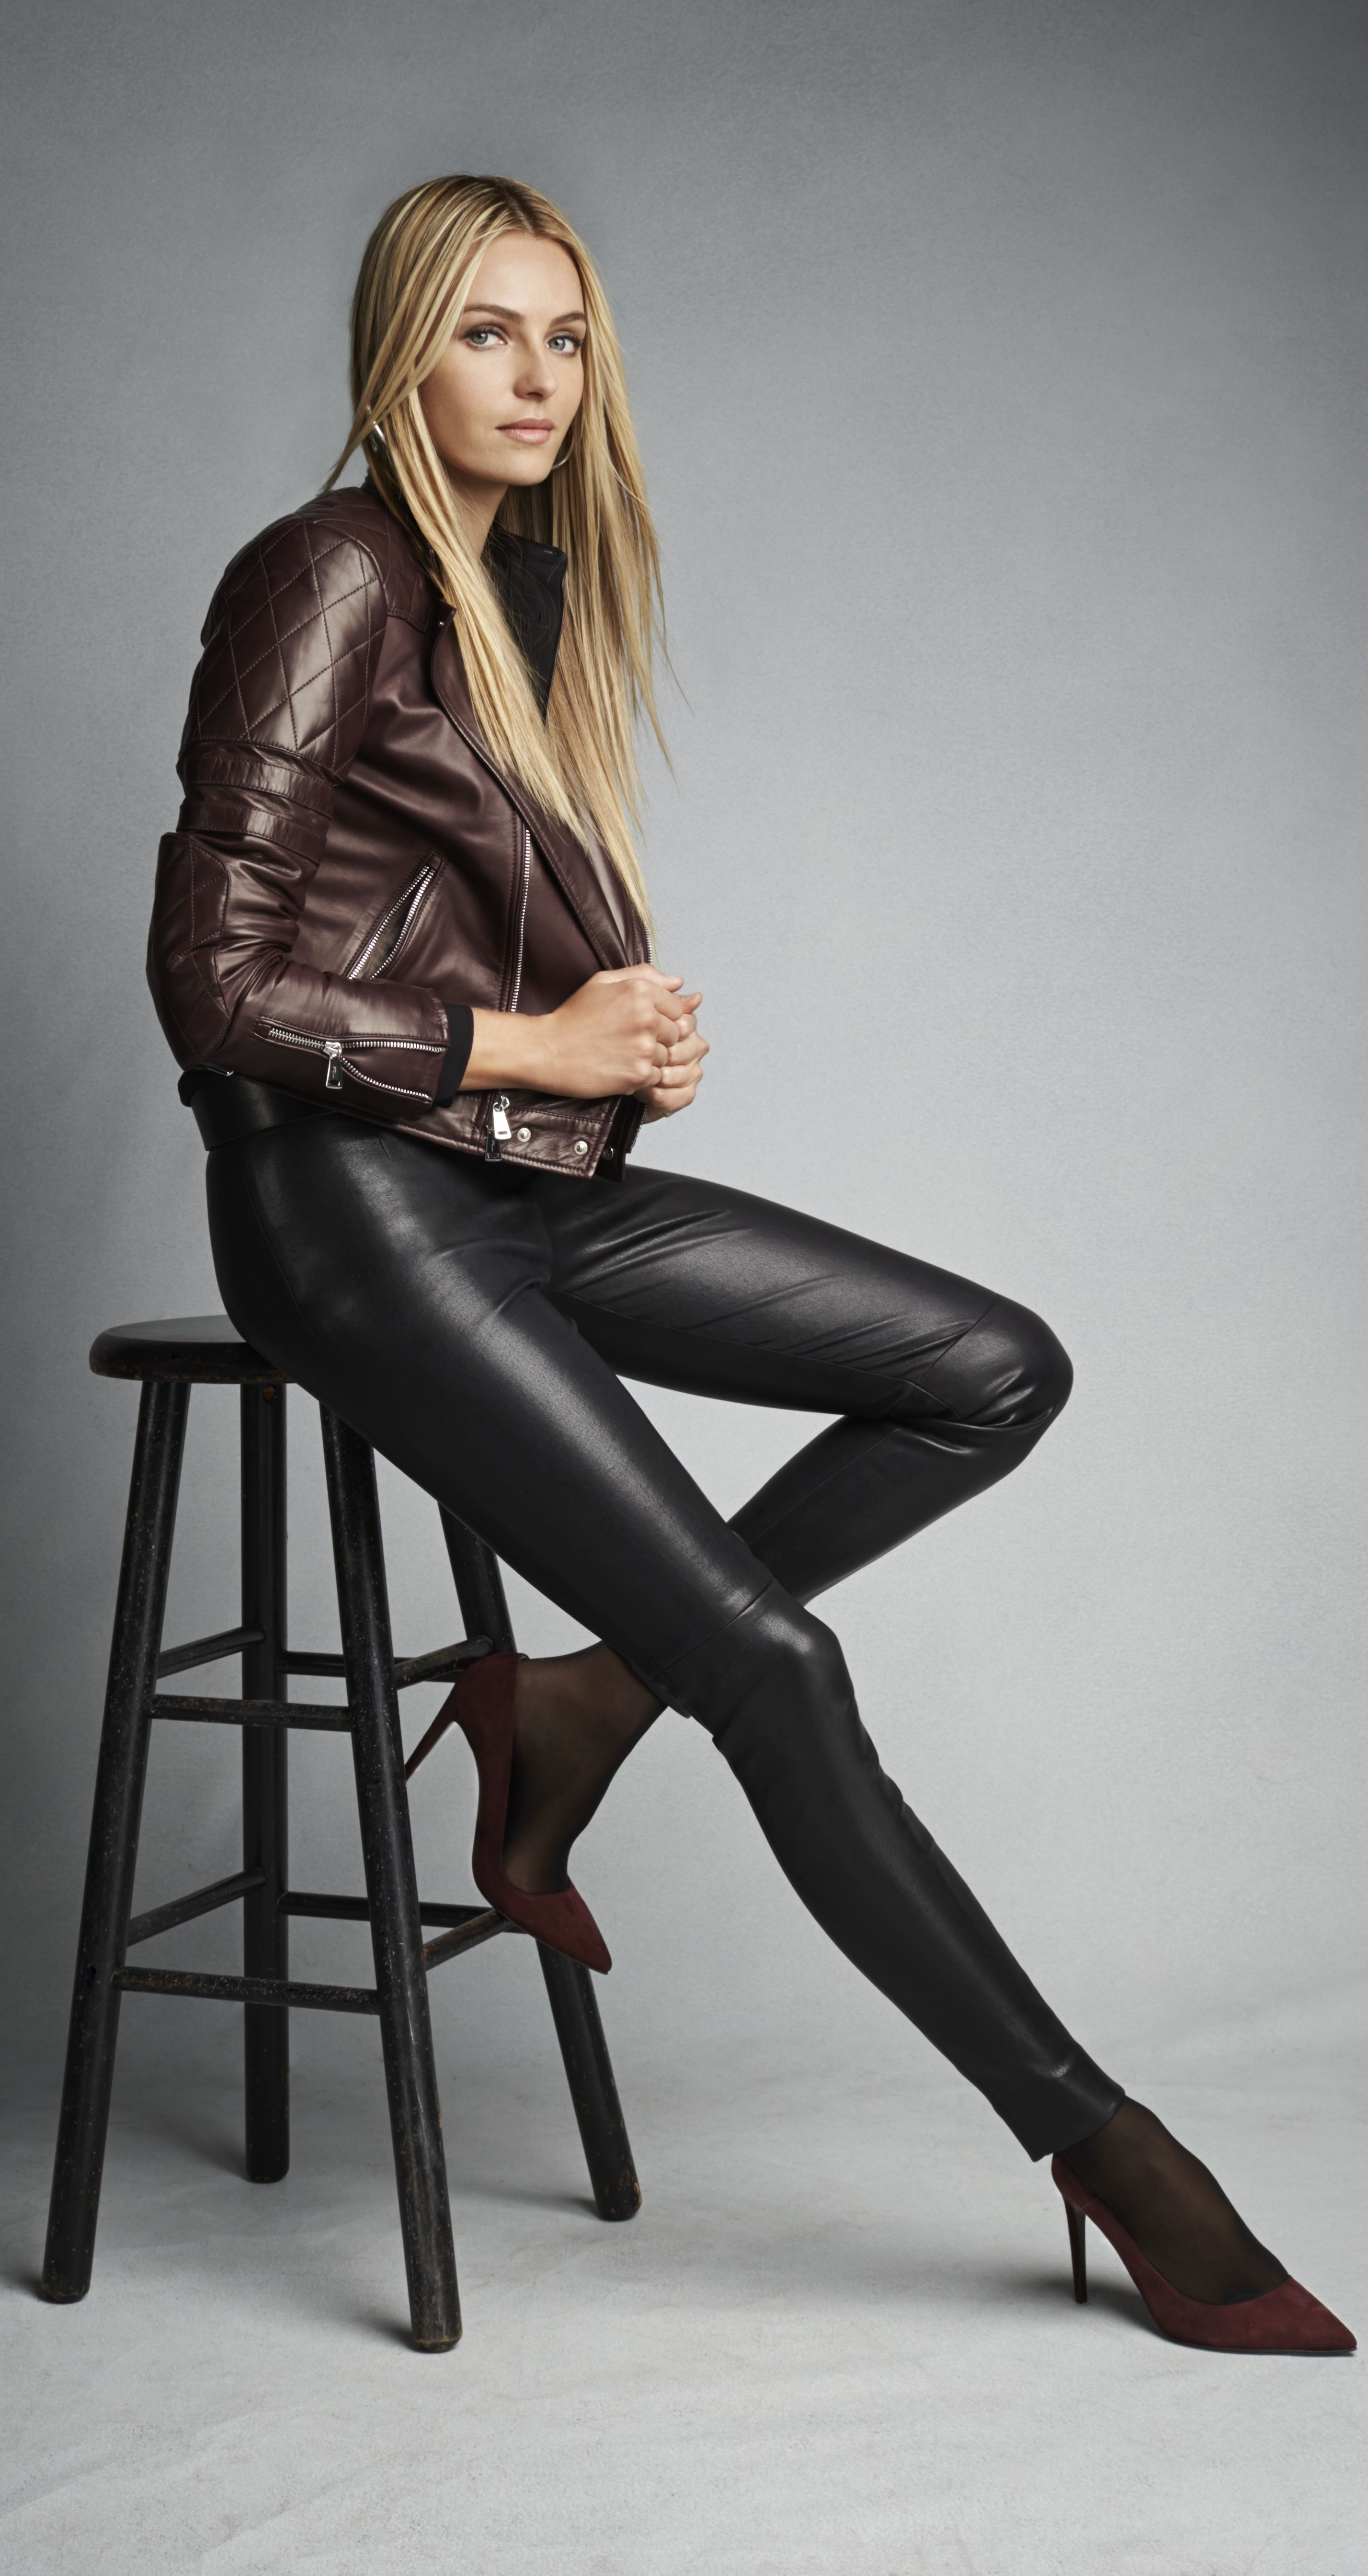 Ralph Lauren Black Label  Bordeaux biker jacket, stretch-leather pant and  suede pumps add depth to the season acdd71b08b